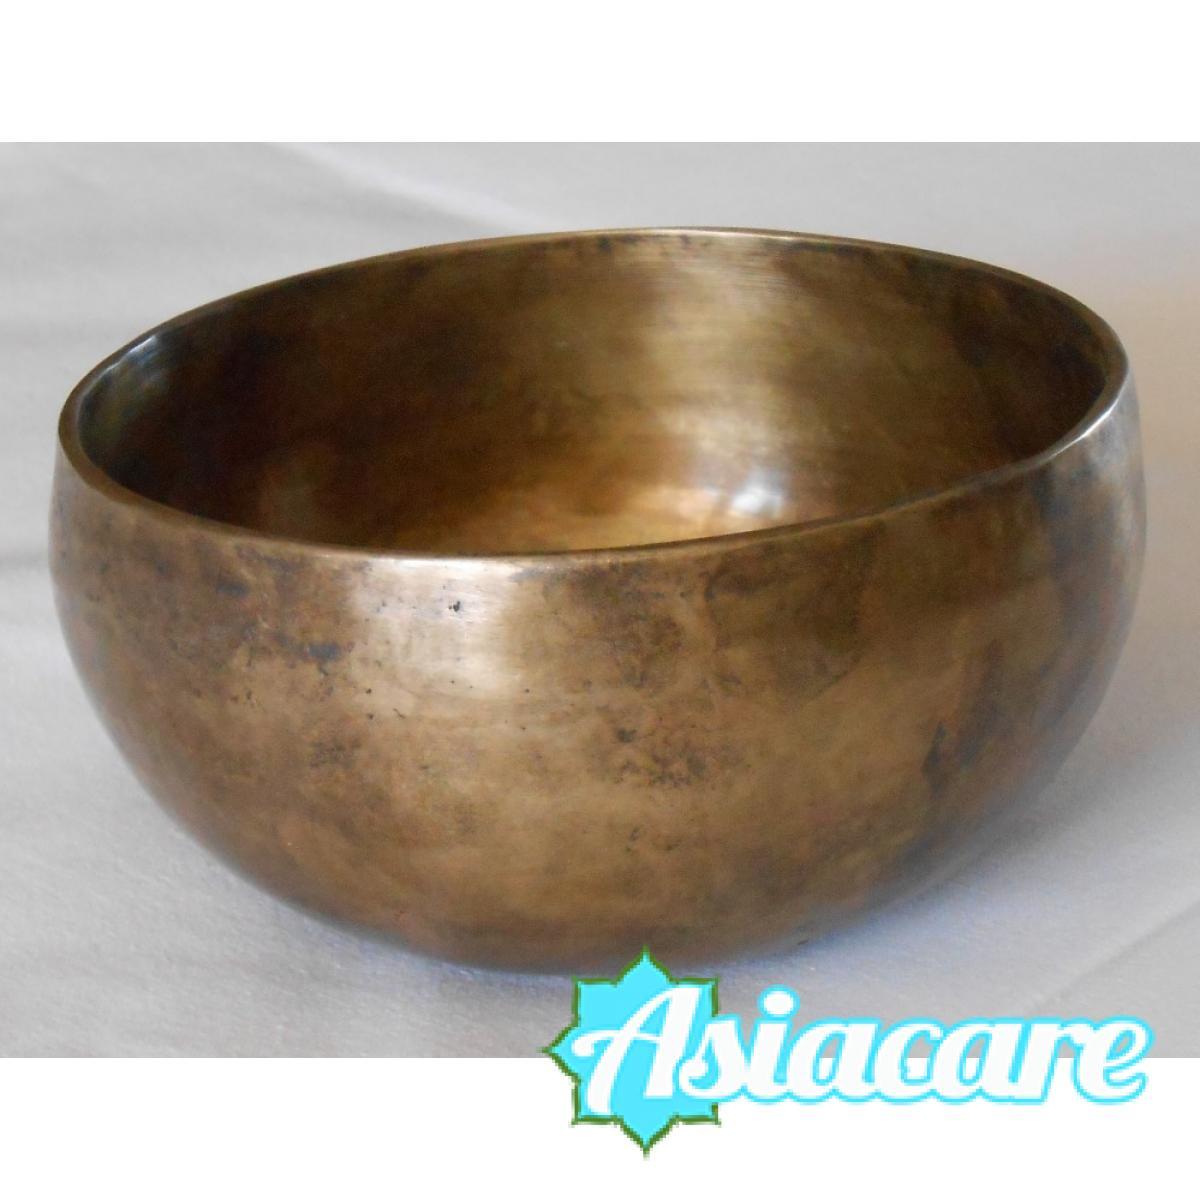 Ръчно кована тибетска пееща купа Nadayaga 250-290 грама с чукче